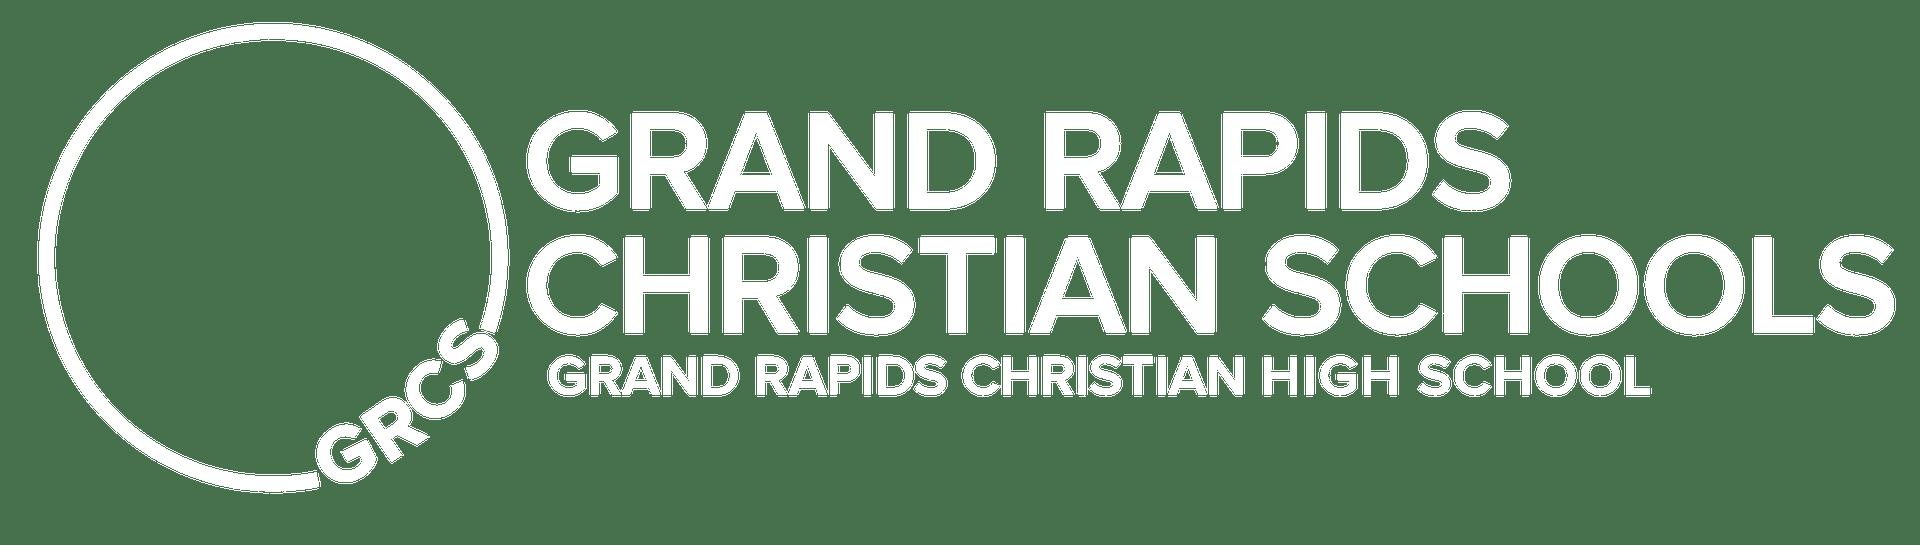 Grand Rapids Christian High School